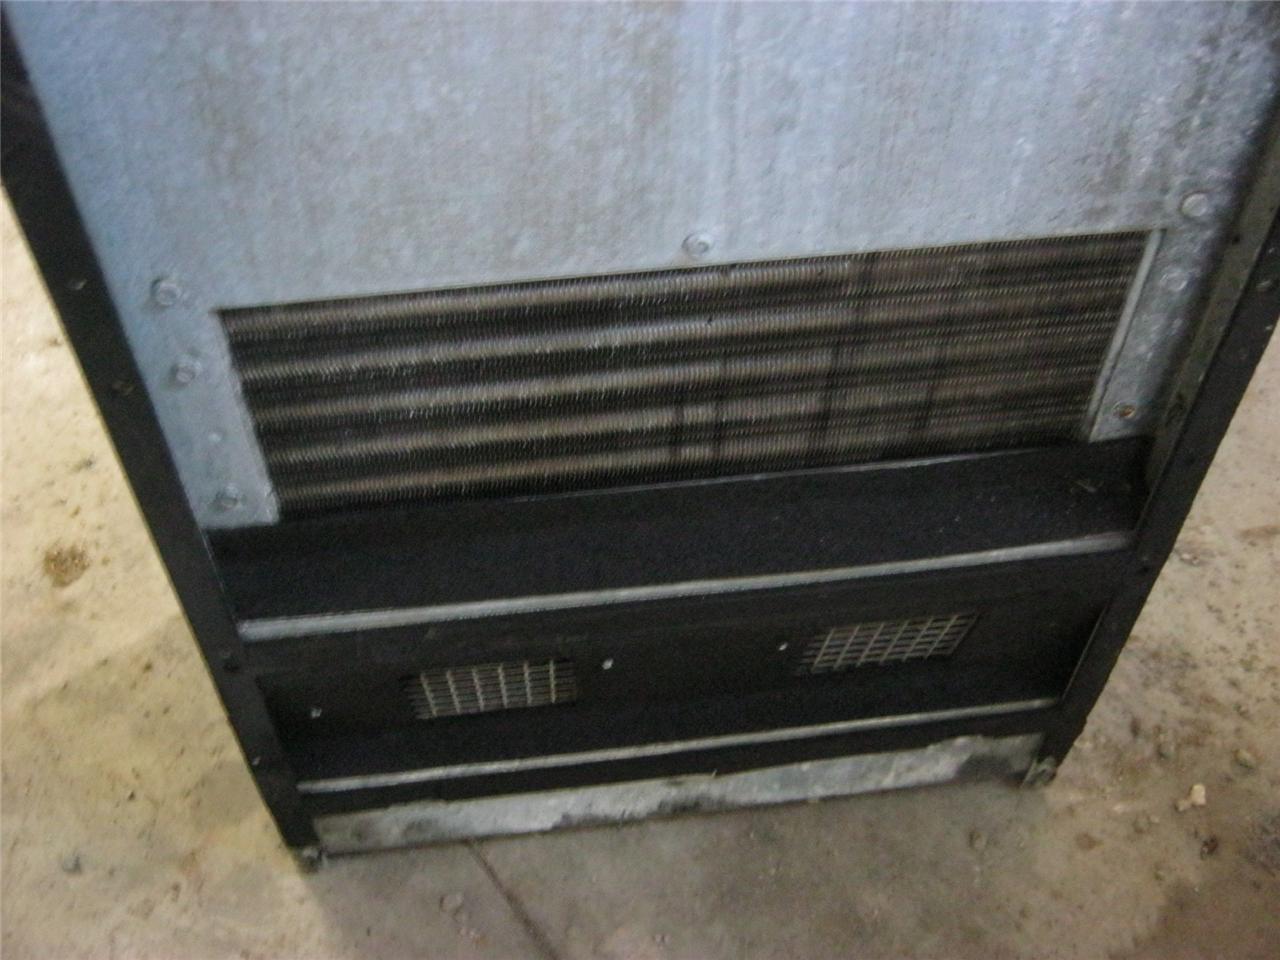 Mclean M52 Side Mount Indoor Air Conditioner 12000 Btu